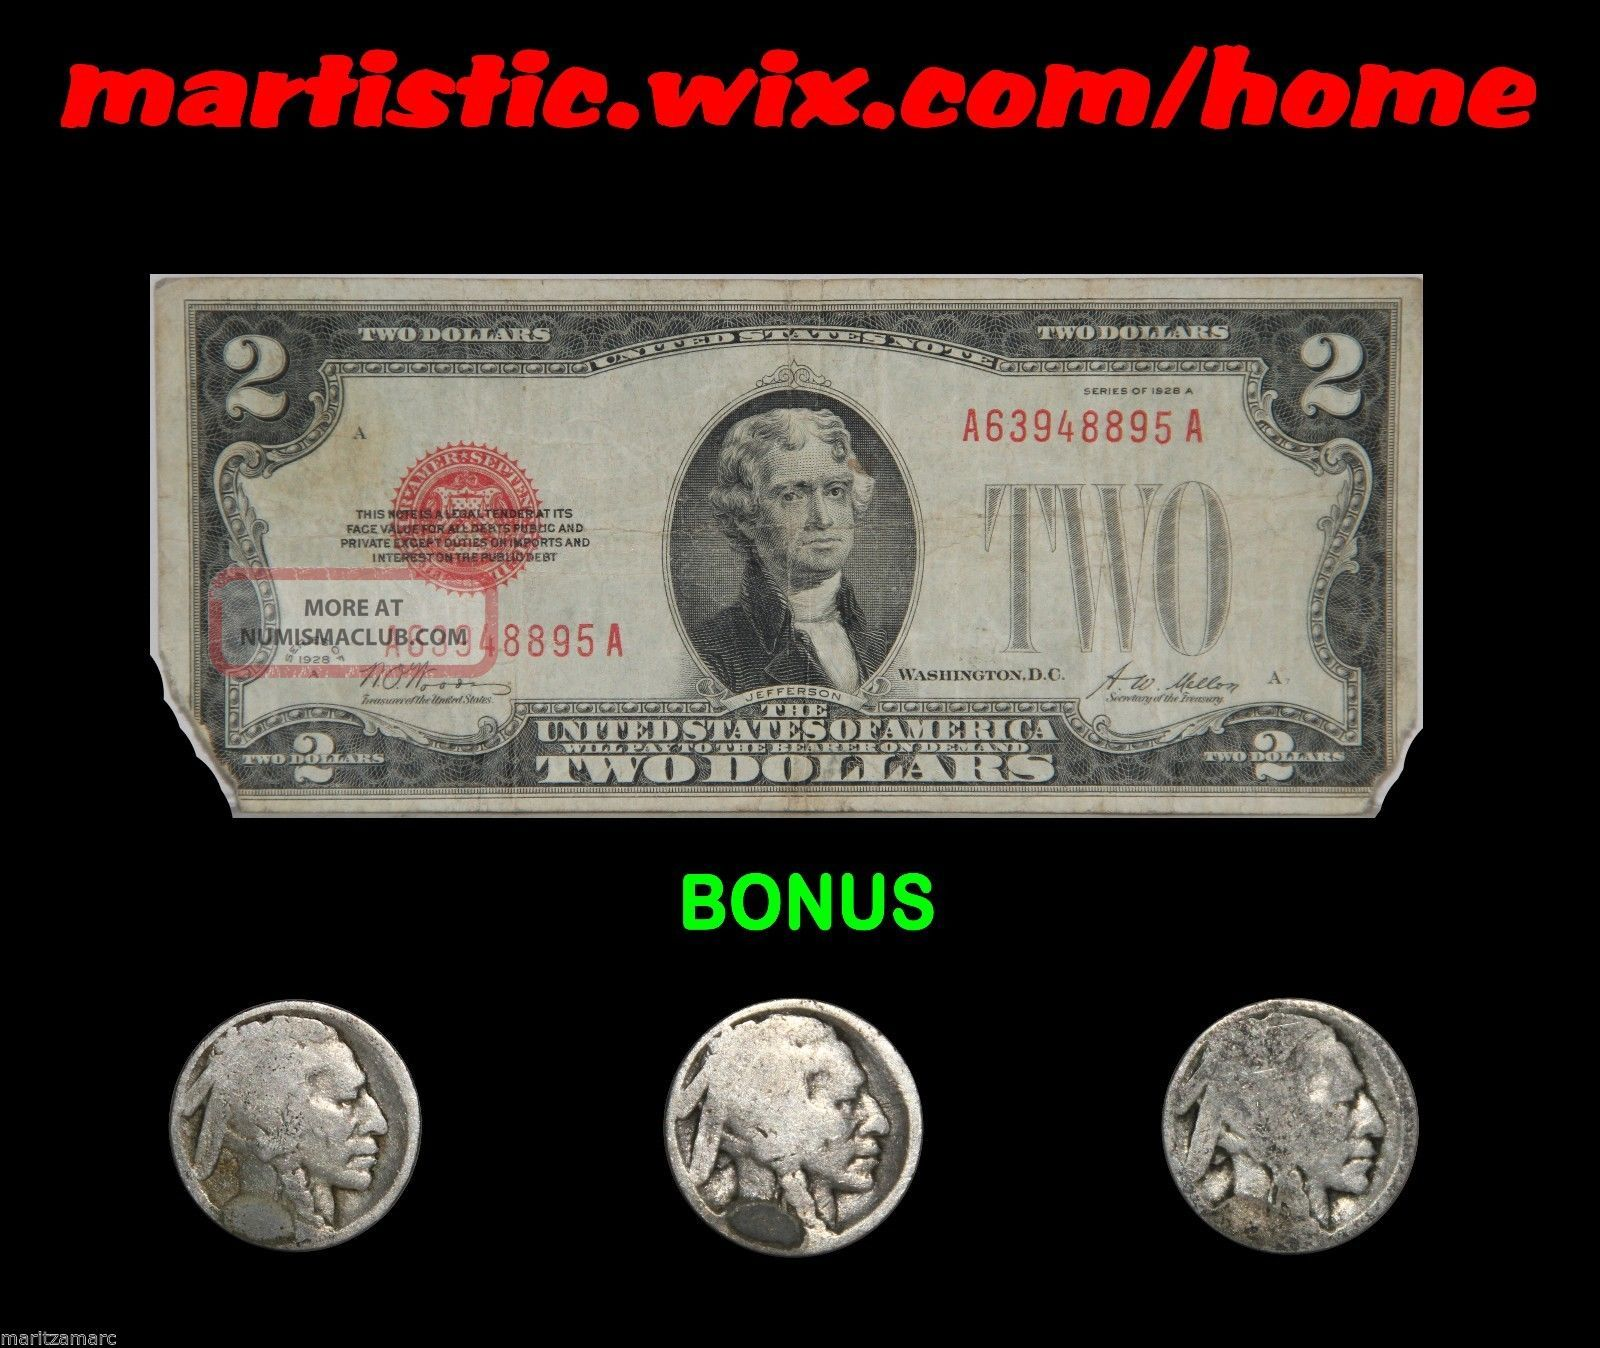 1928 - A $2 Us Red Seal Note Plus Bonus Buffalo Nickel